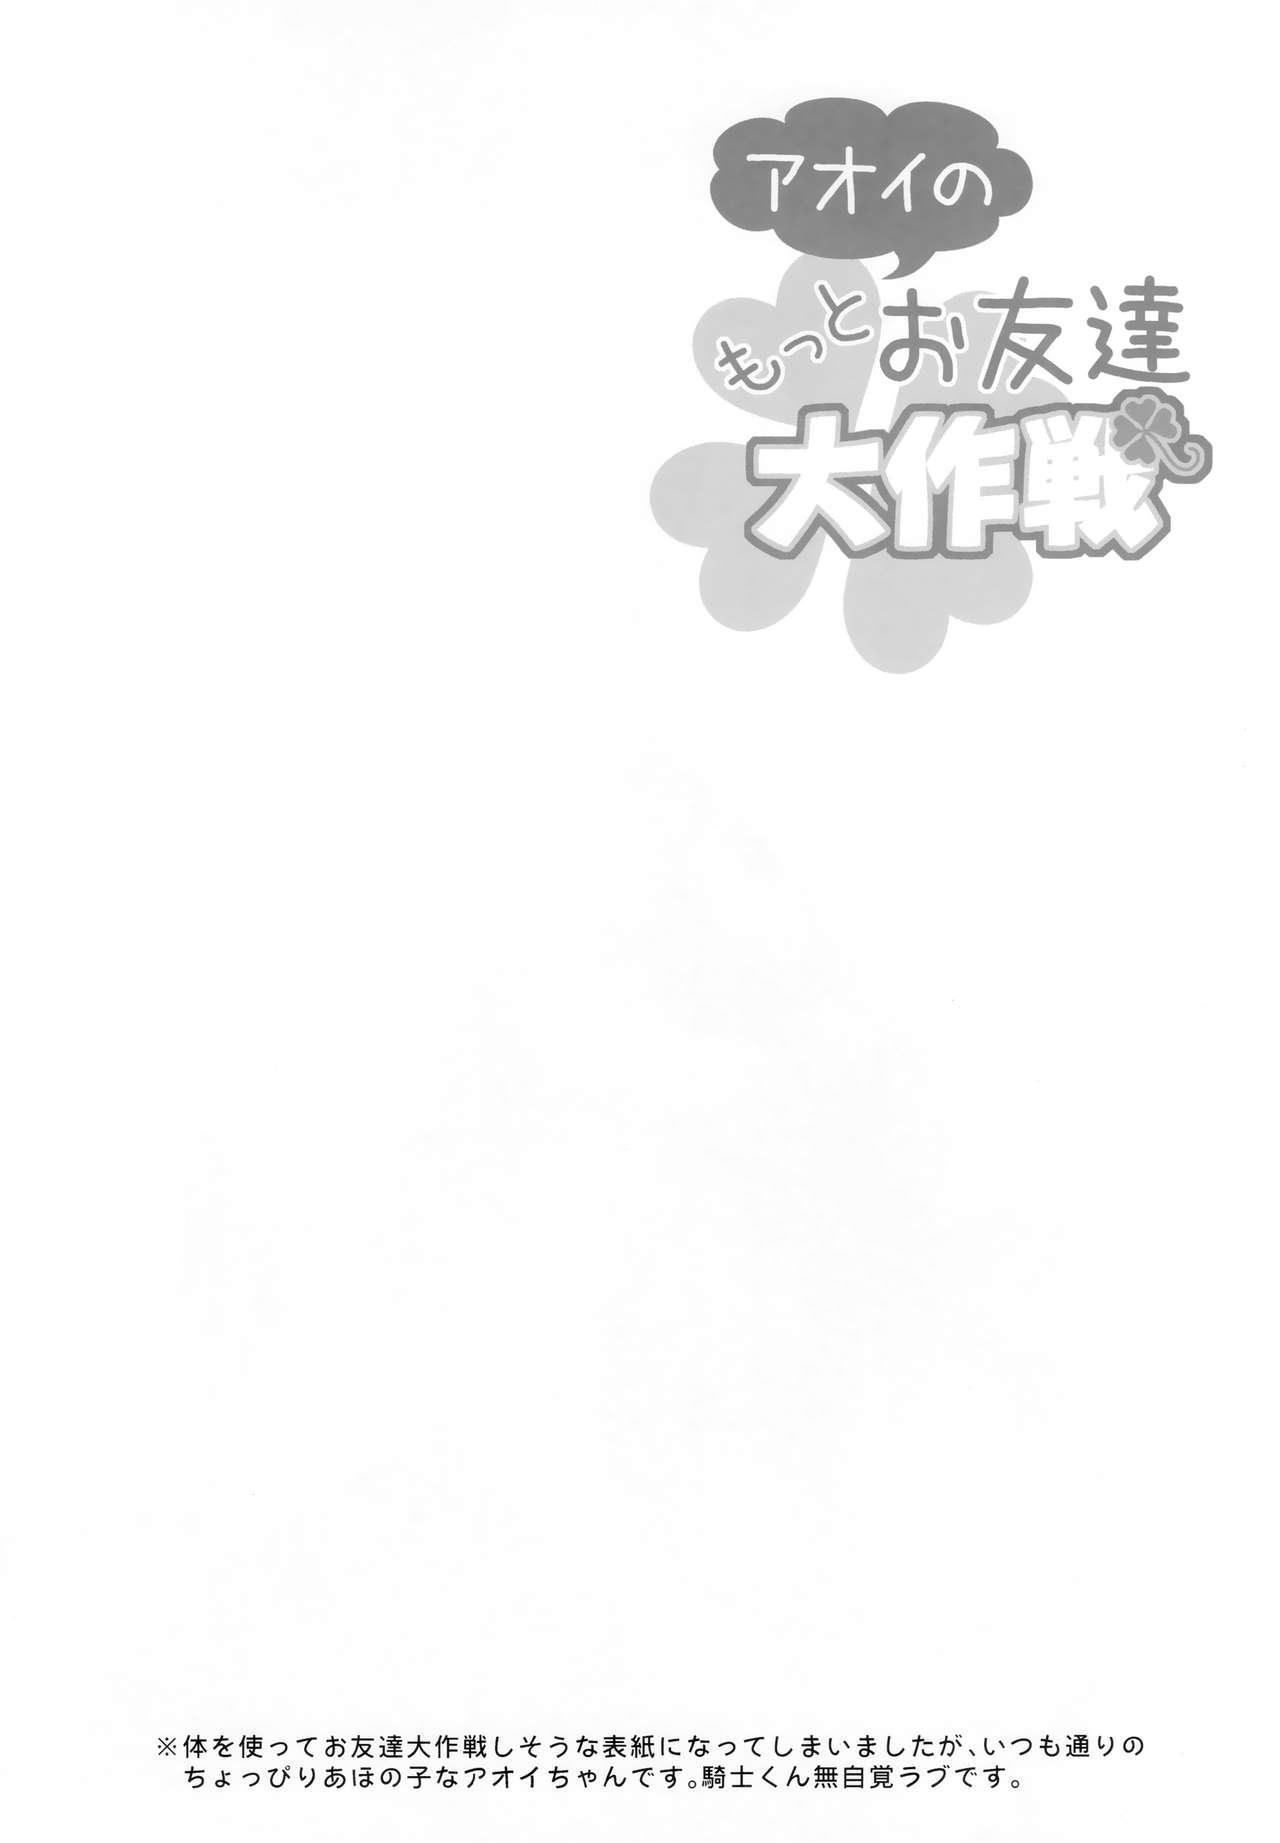 Aoi no Motto Otomodachi Daisakusen 2